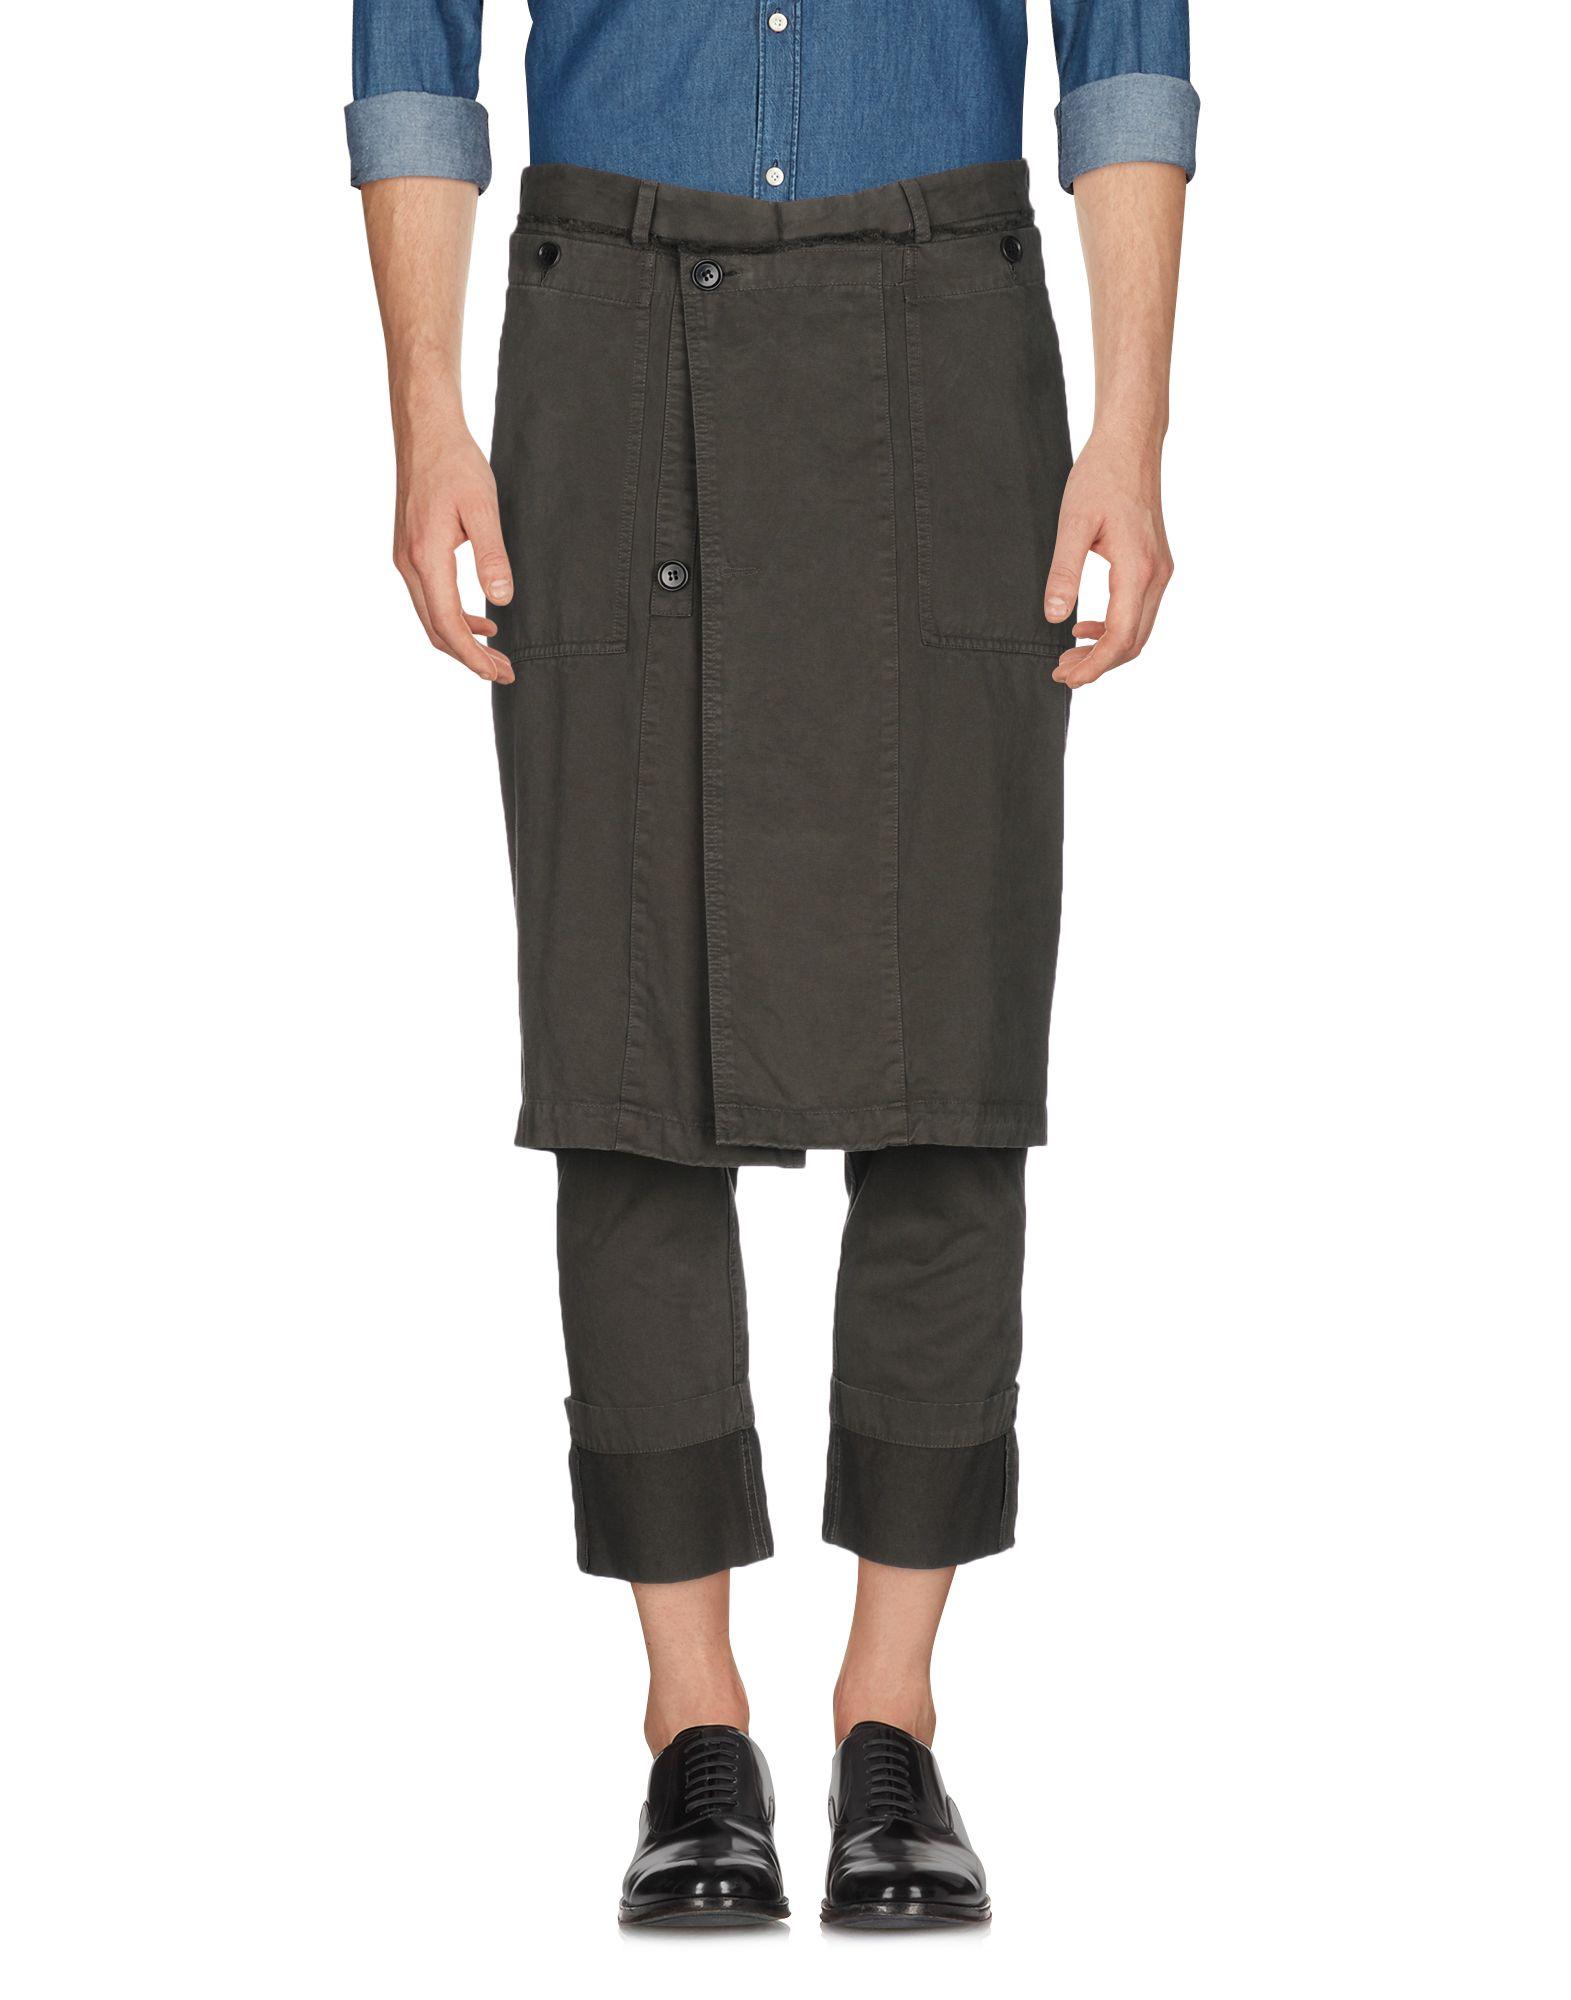 Pantalone Dries Van Noten Uomo - Acquista online su